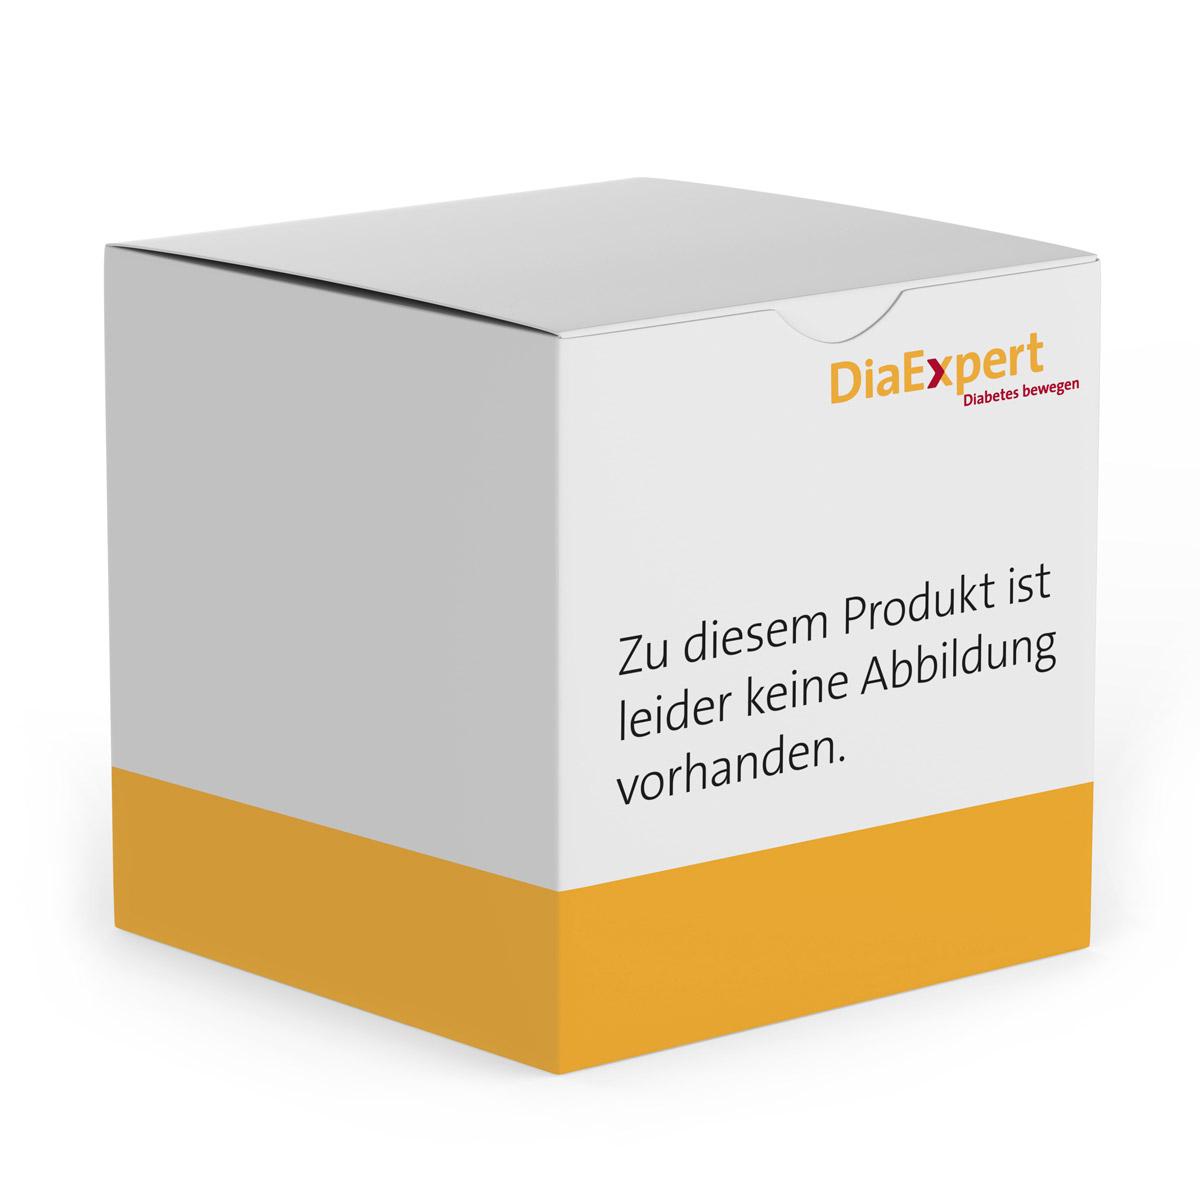 Diabetes-Kette Edelstahl Maura 46-52 cm